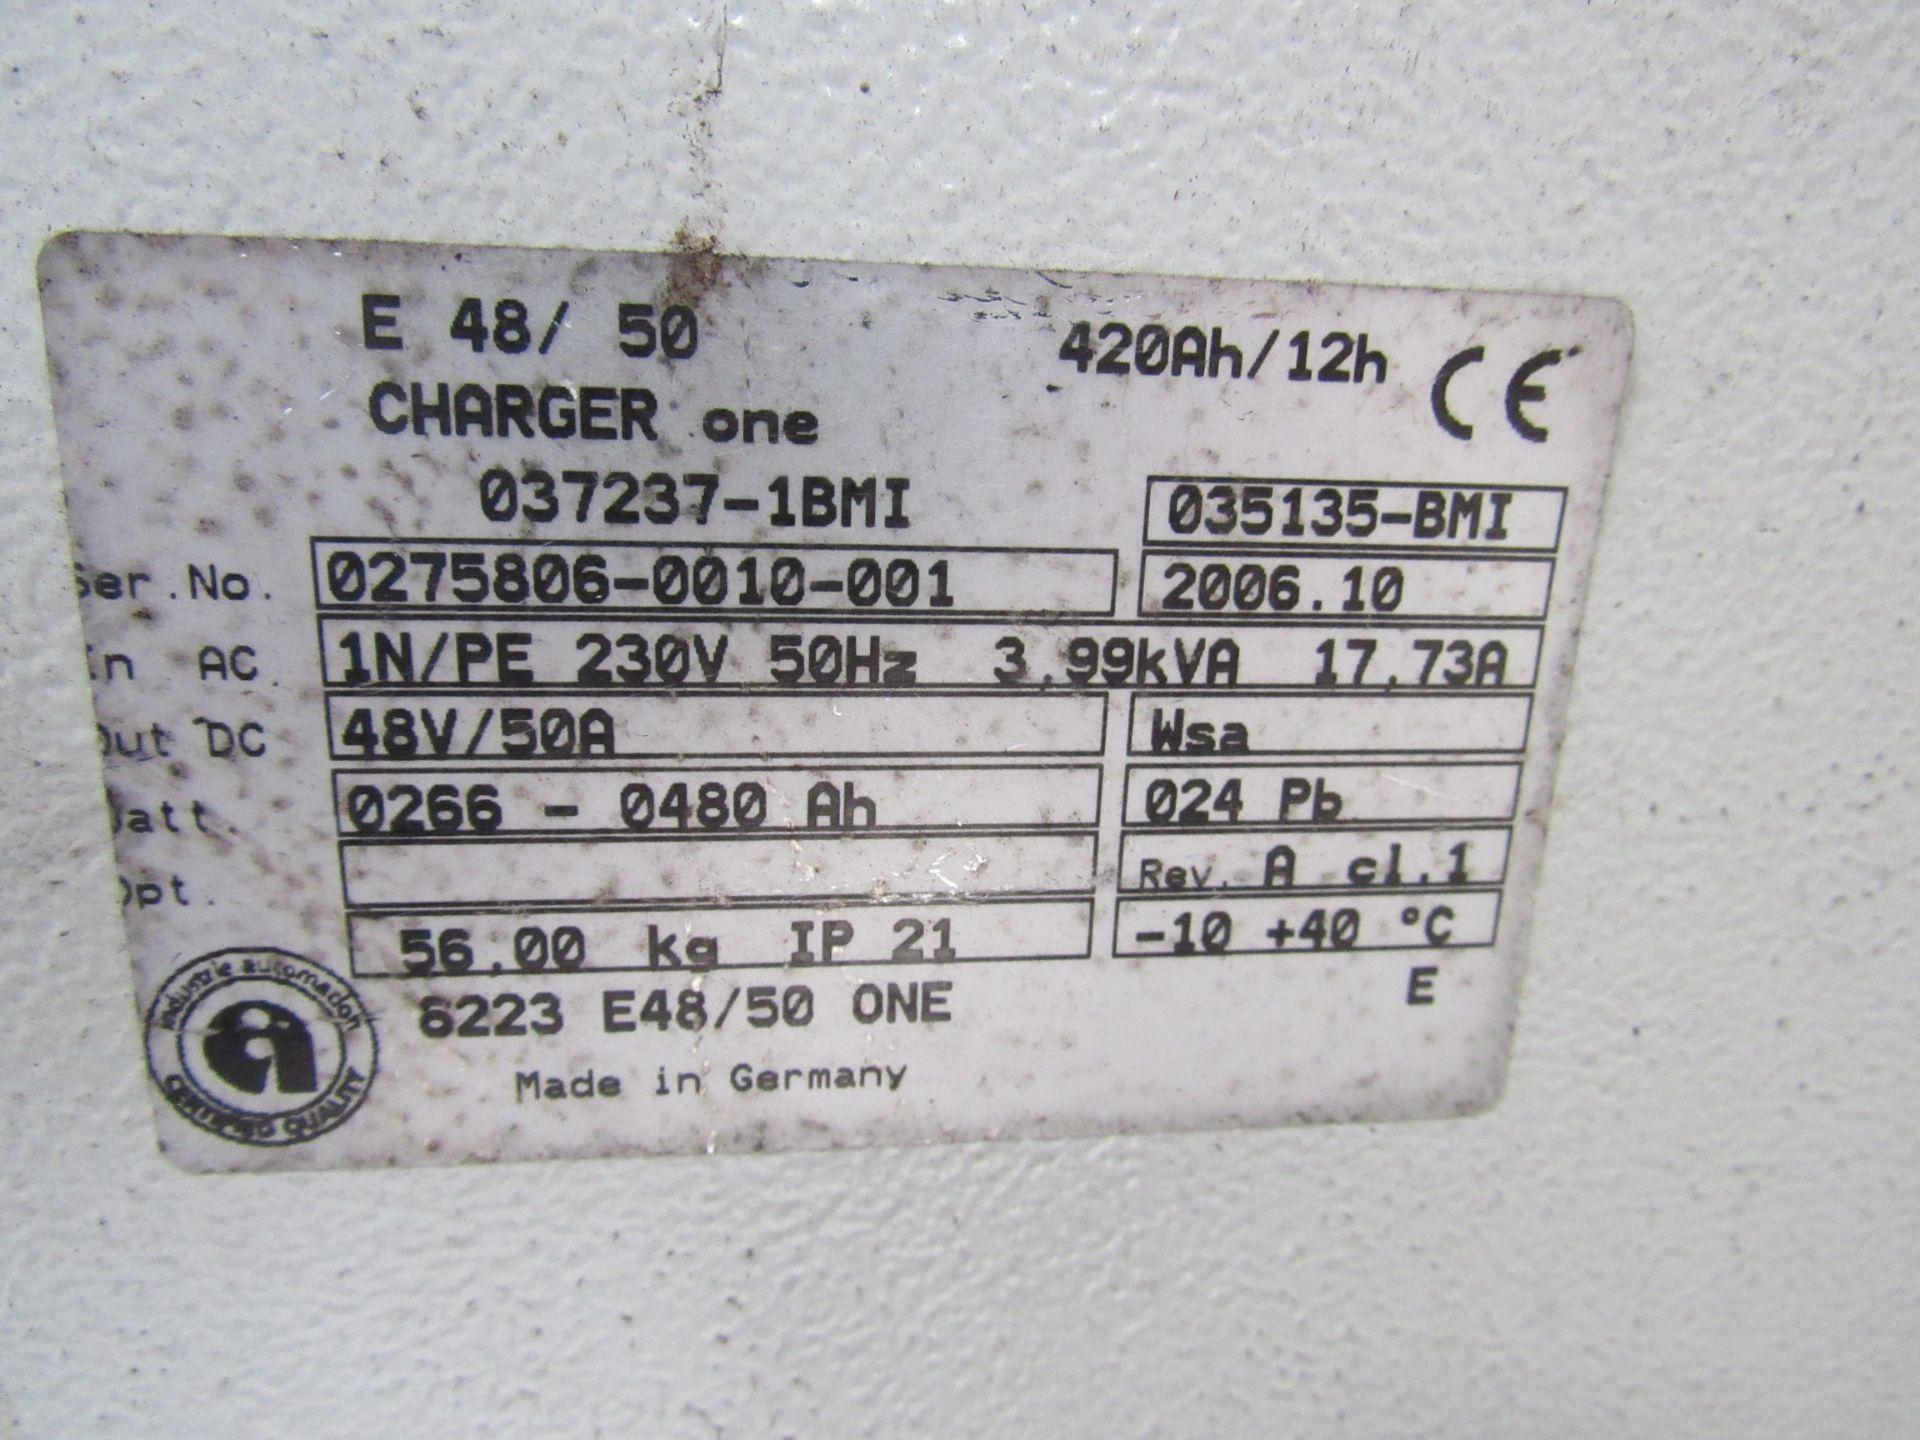 Doosan Daewoo B15T-5 Battery Forklift, 1320kg Capacity, 2278 Hours, Triple Mast, Side Shift, 2007, - Image 21 of 21